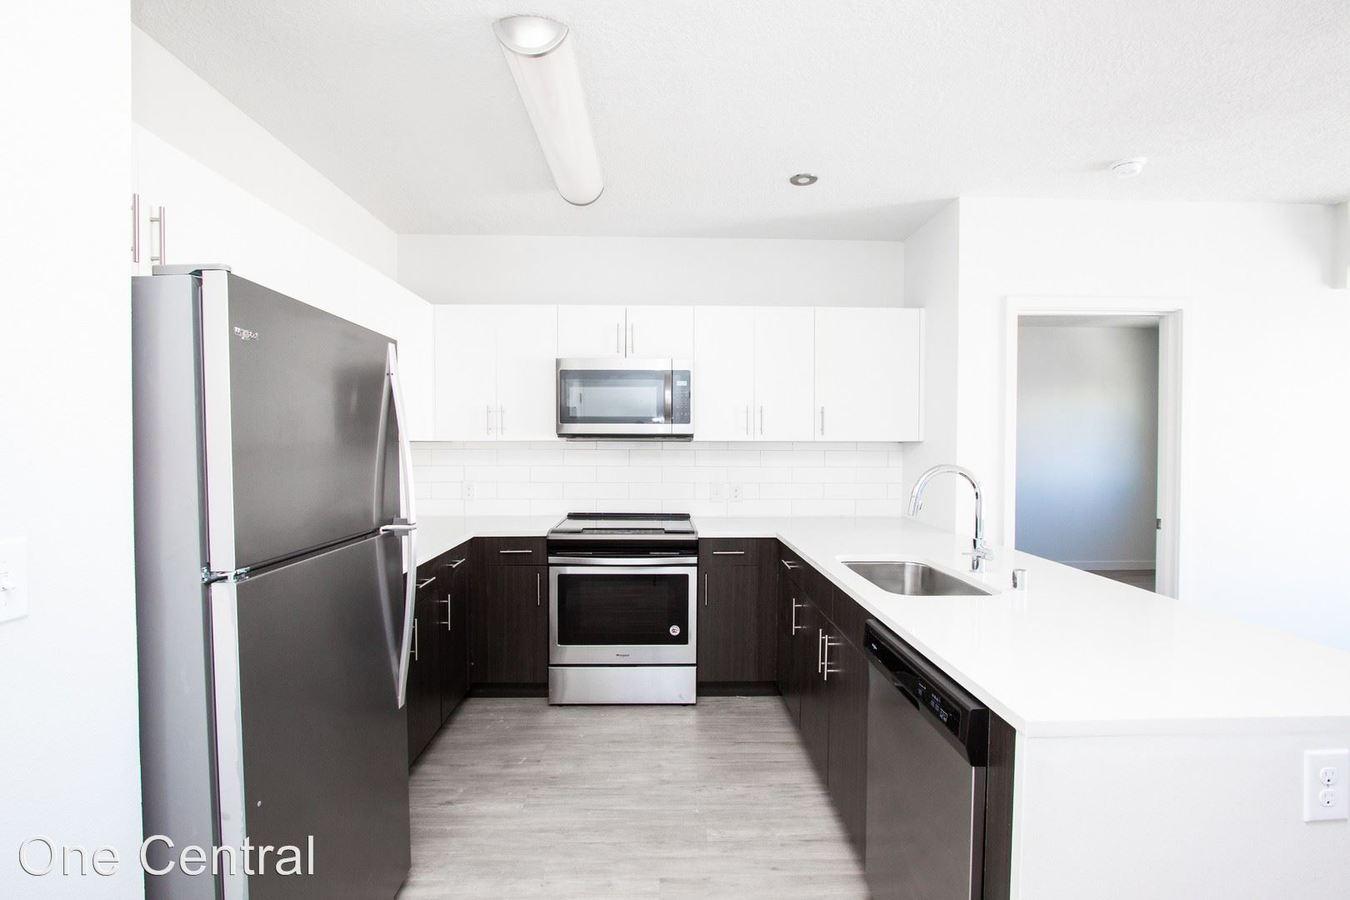 Superb 1 Central Ave Nw Albuquerque Nm Apartment For Rent Interior Design Ideas Skatsoteloinfo